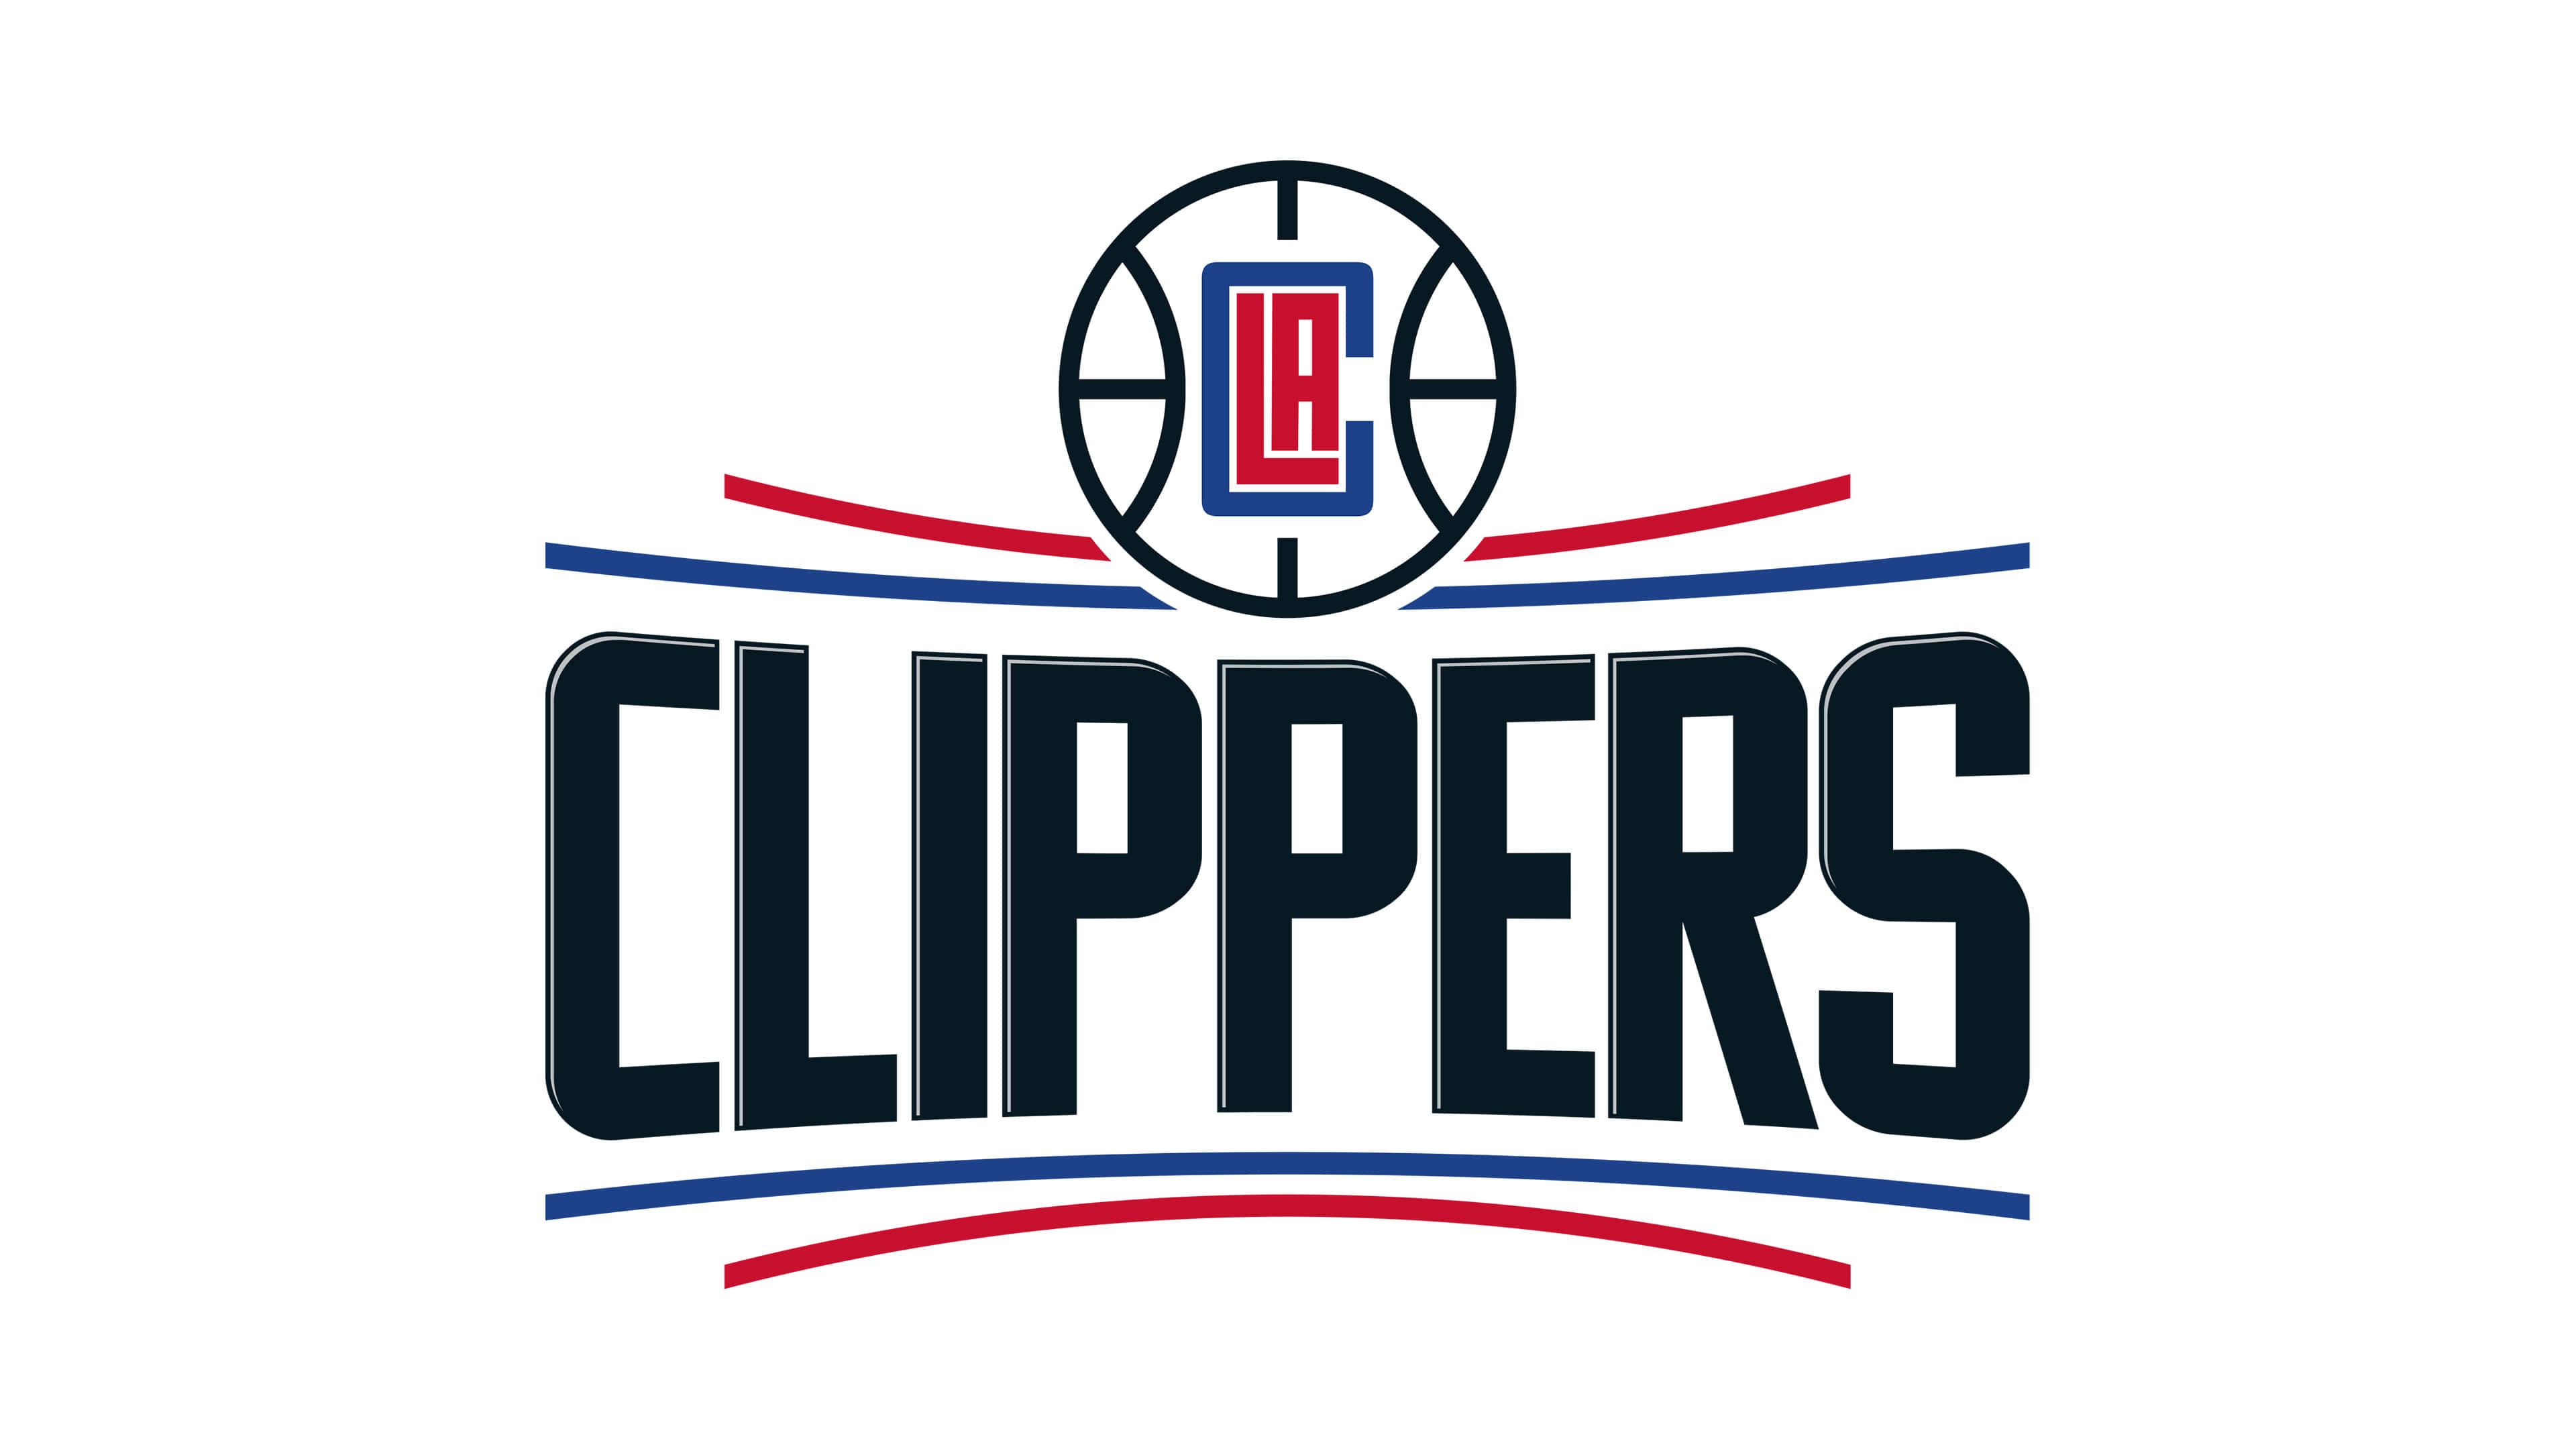 San Antonio Spurs Nba - Los Angeles Clippers Logo 2018 , HD Wallpaper & Backgrounds